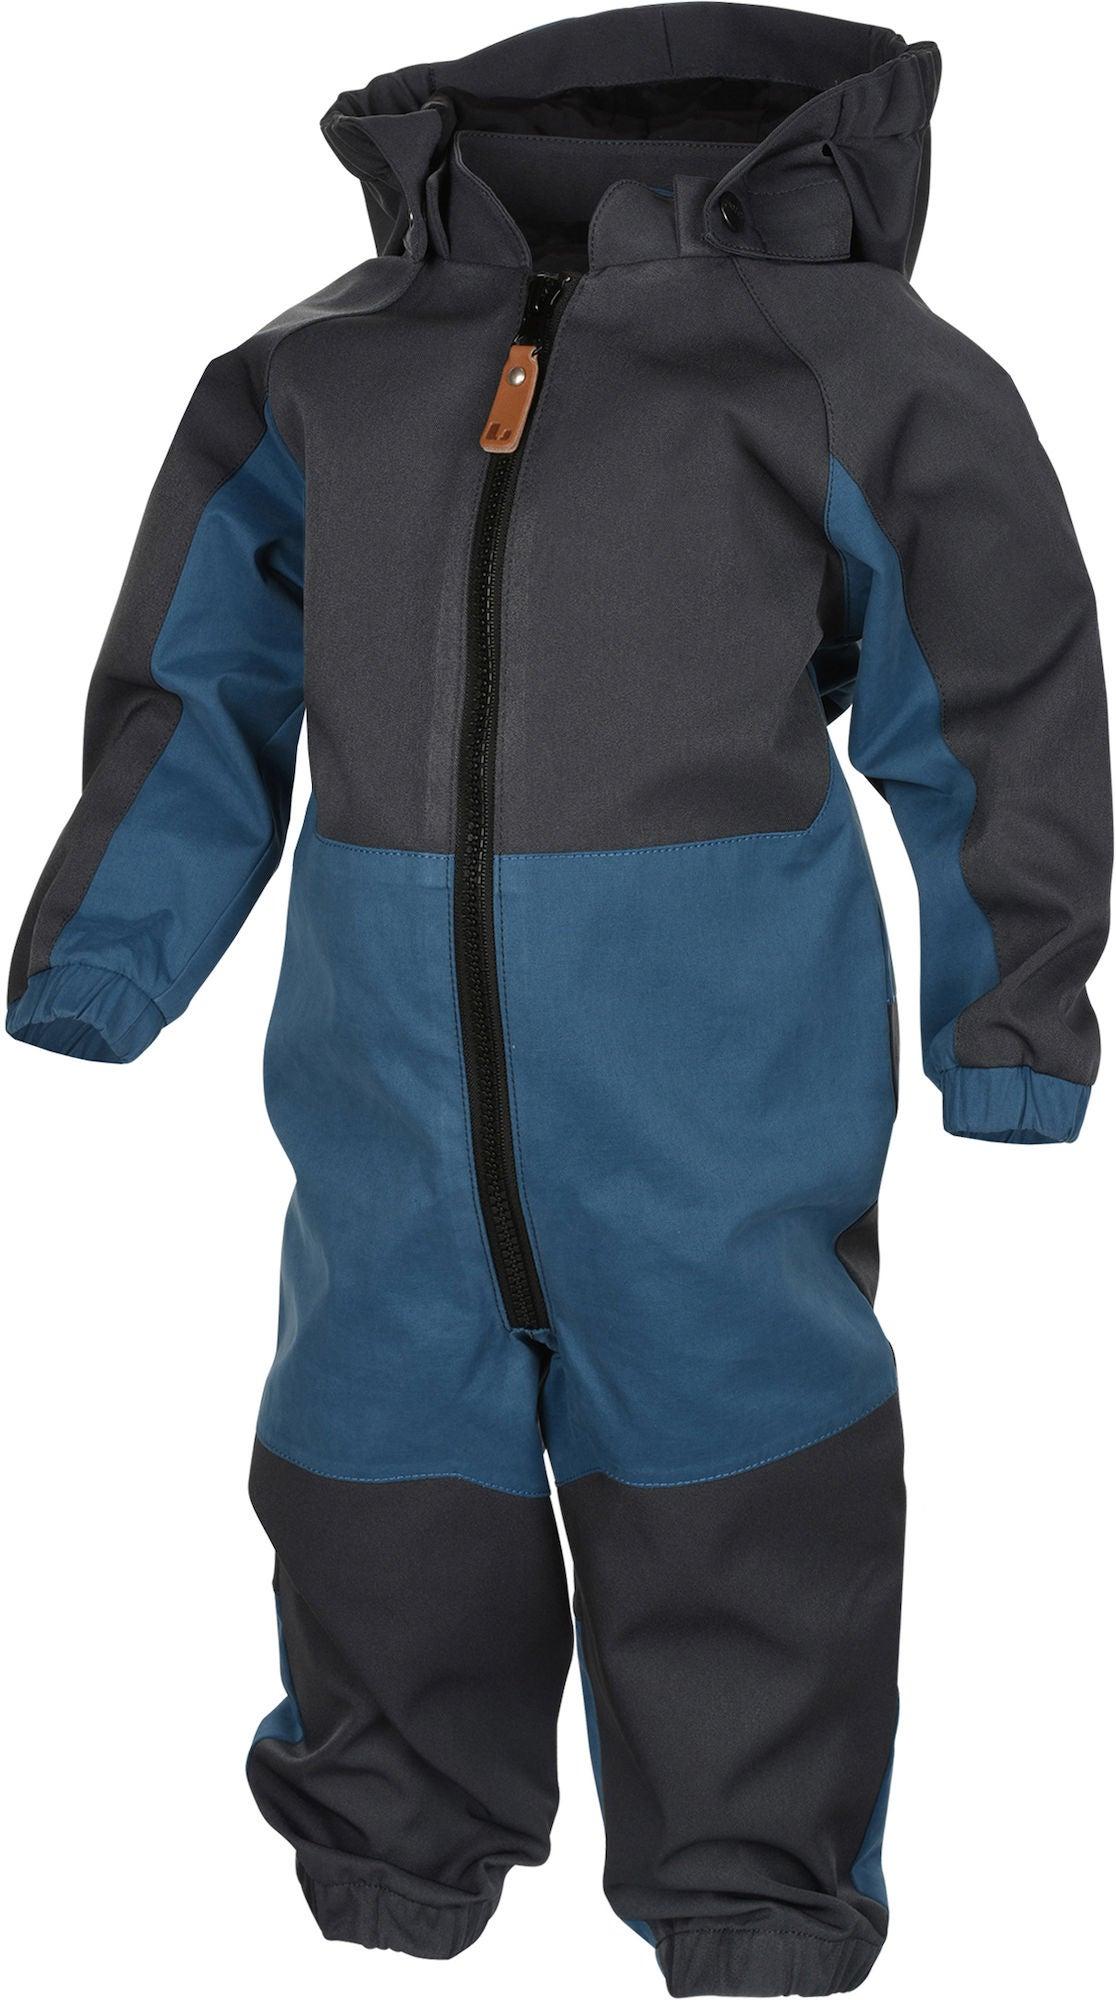 Lindberg Explorer Overall, Blue 74